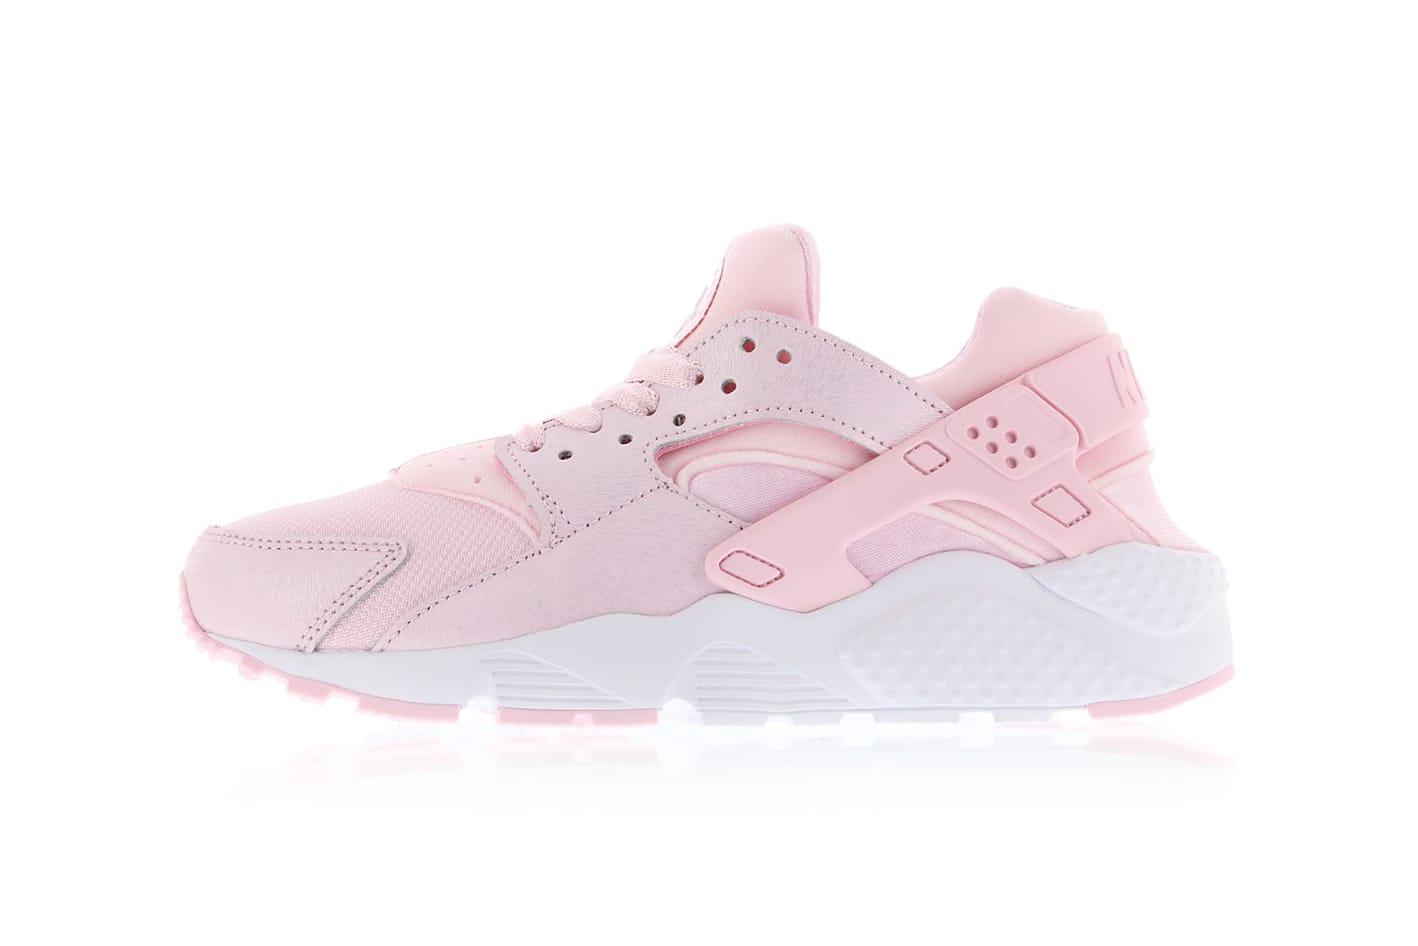 Nike Air Huarache Run Goes Prism Pink